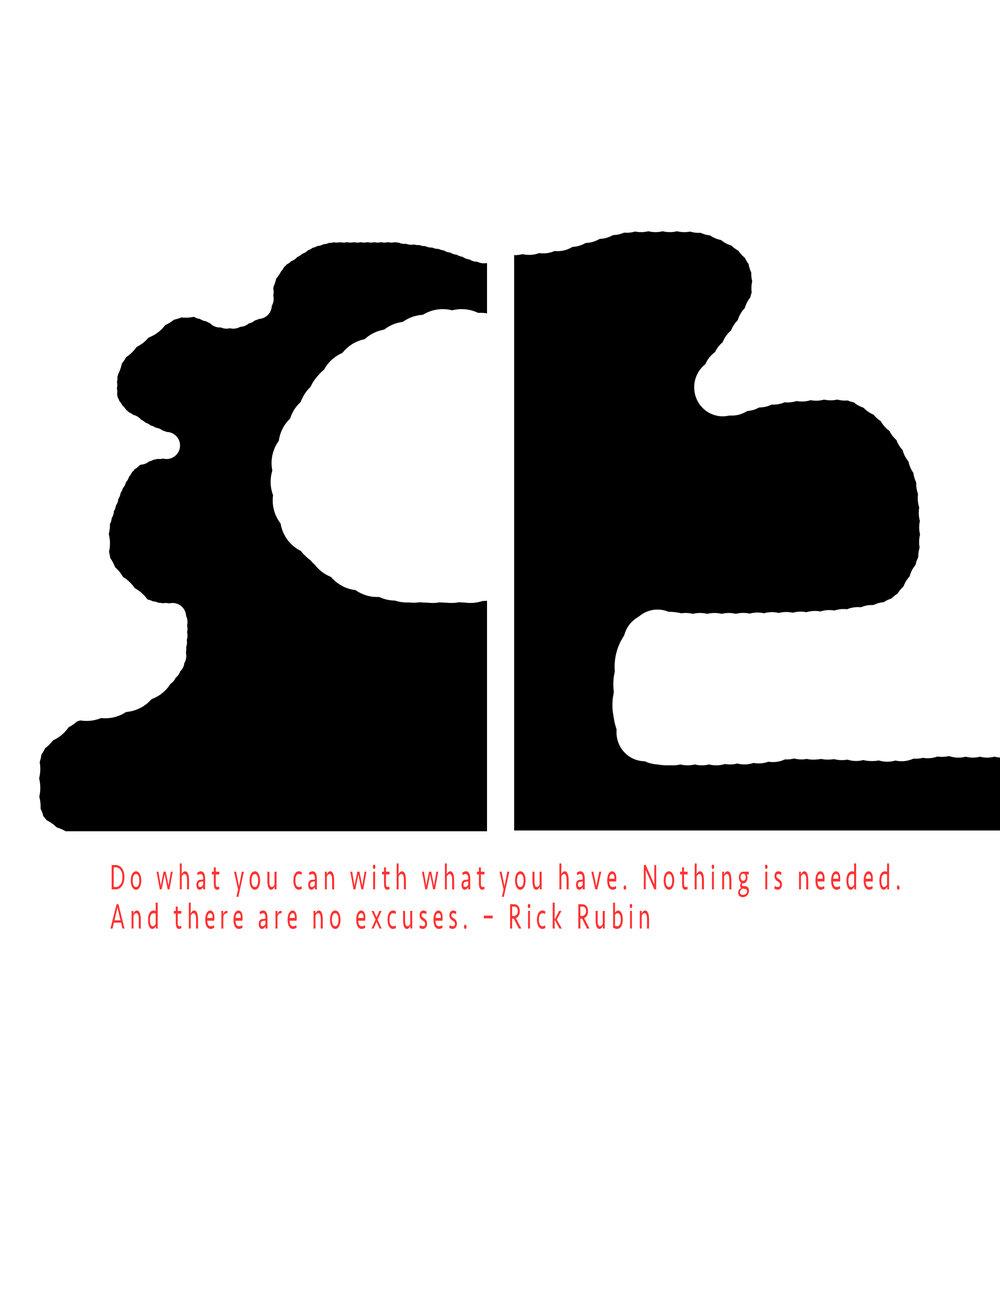 I&B rick rubin quote 101818.jpg